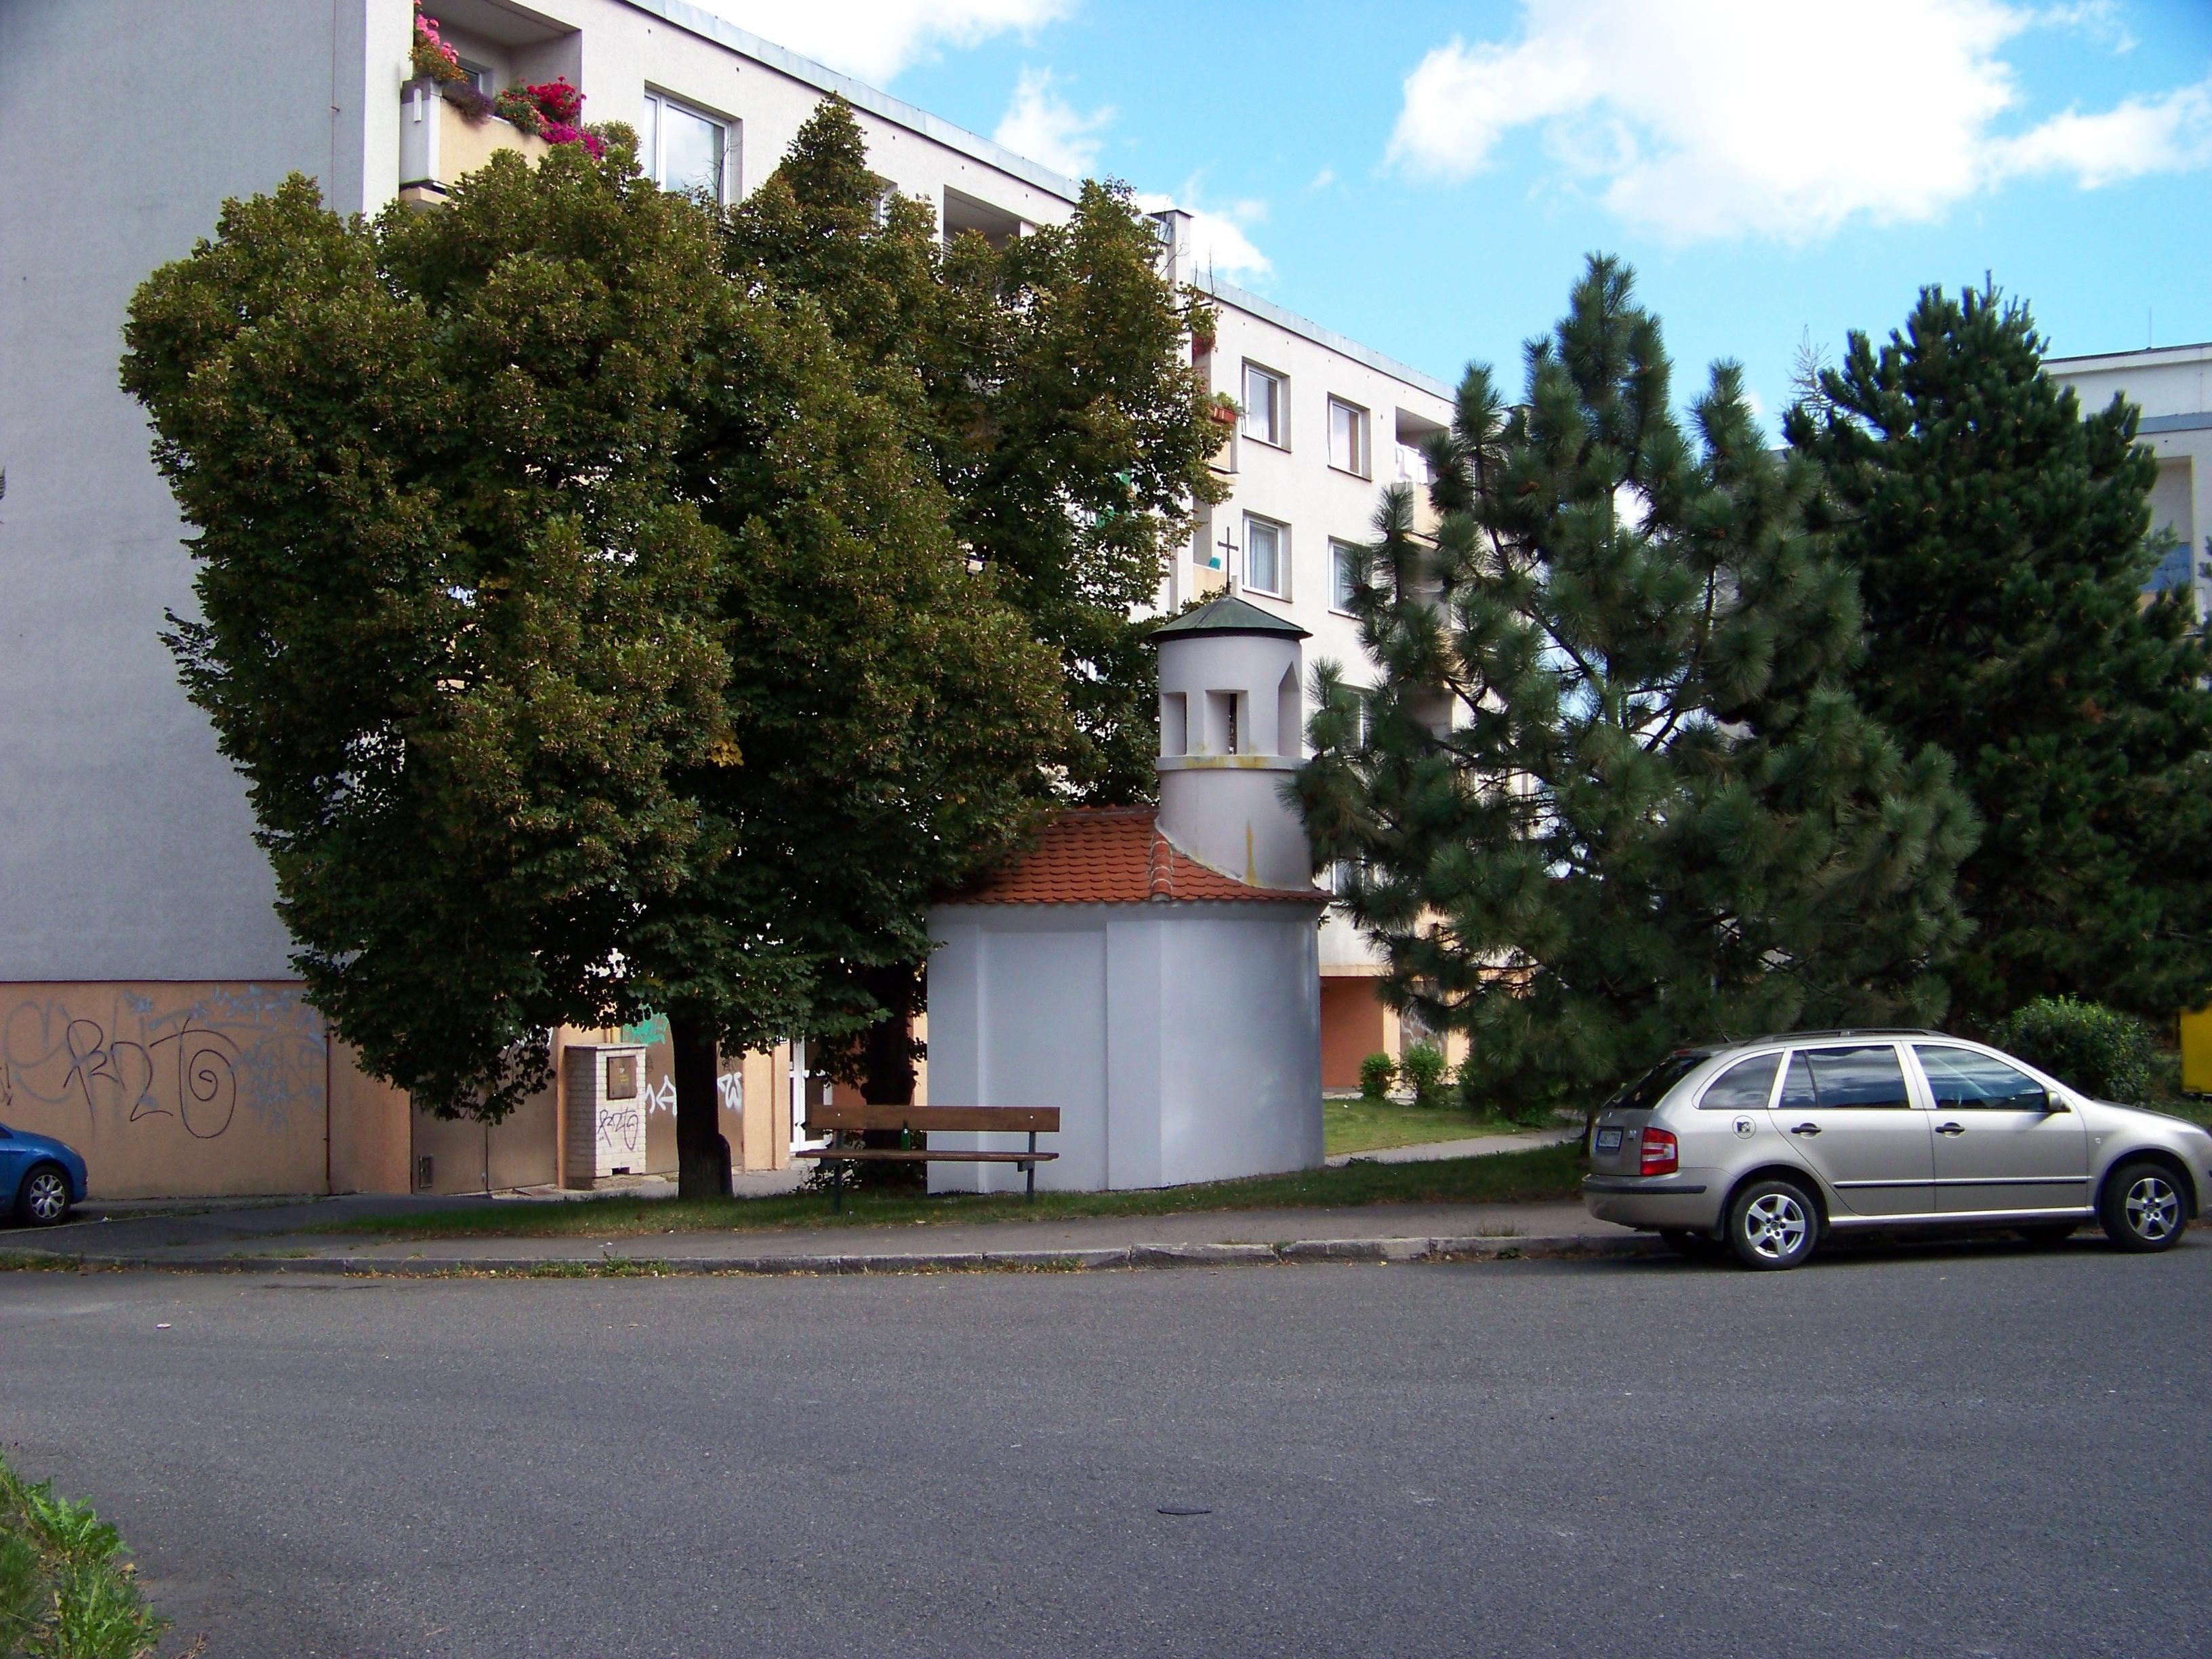 ŠJů, Wikimedia Commons, CC BY-SA 3.0 <https://creativecommons.org/licenses/by-sa/3.0>, via Wikimedia Commons